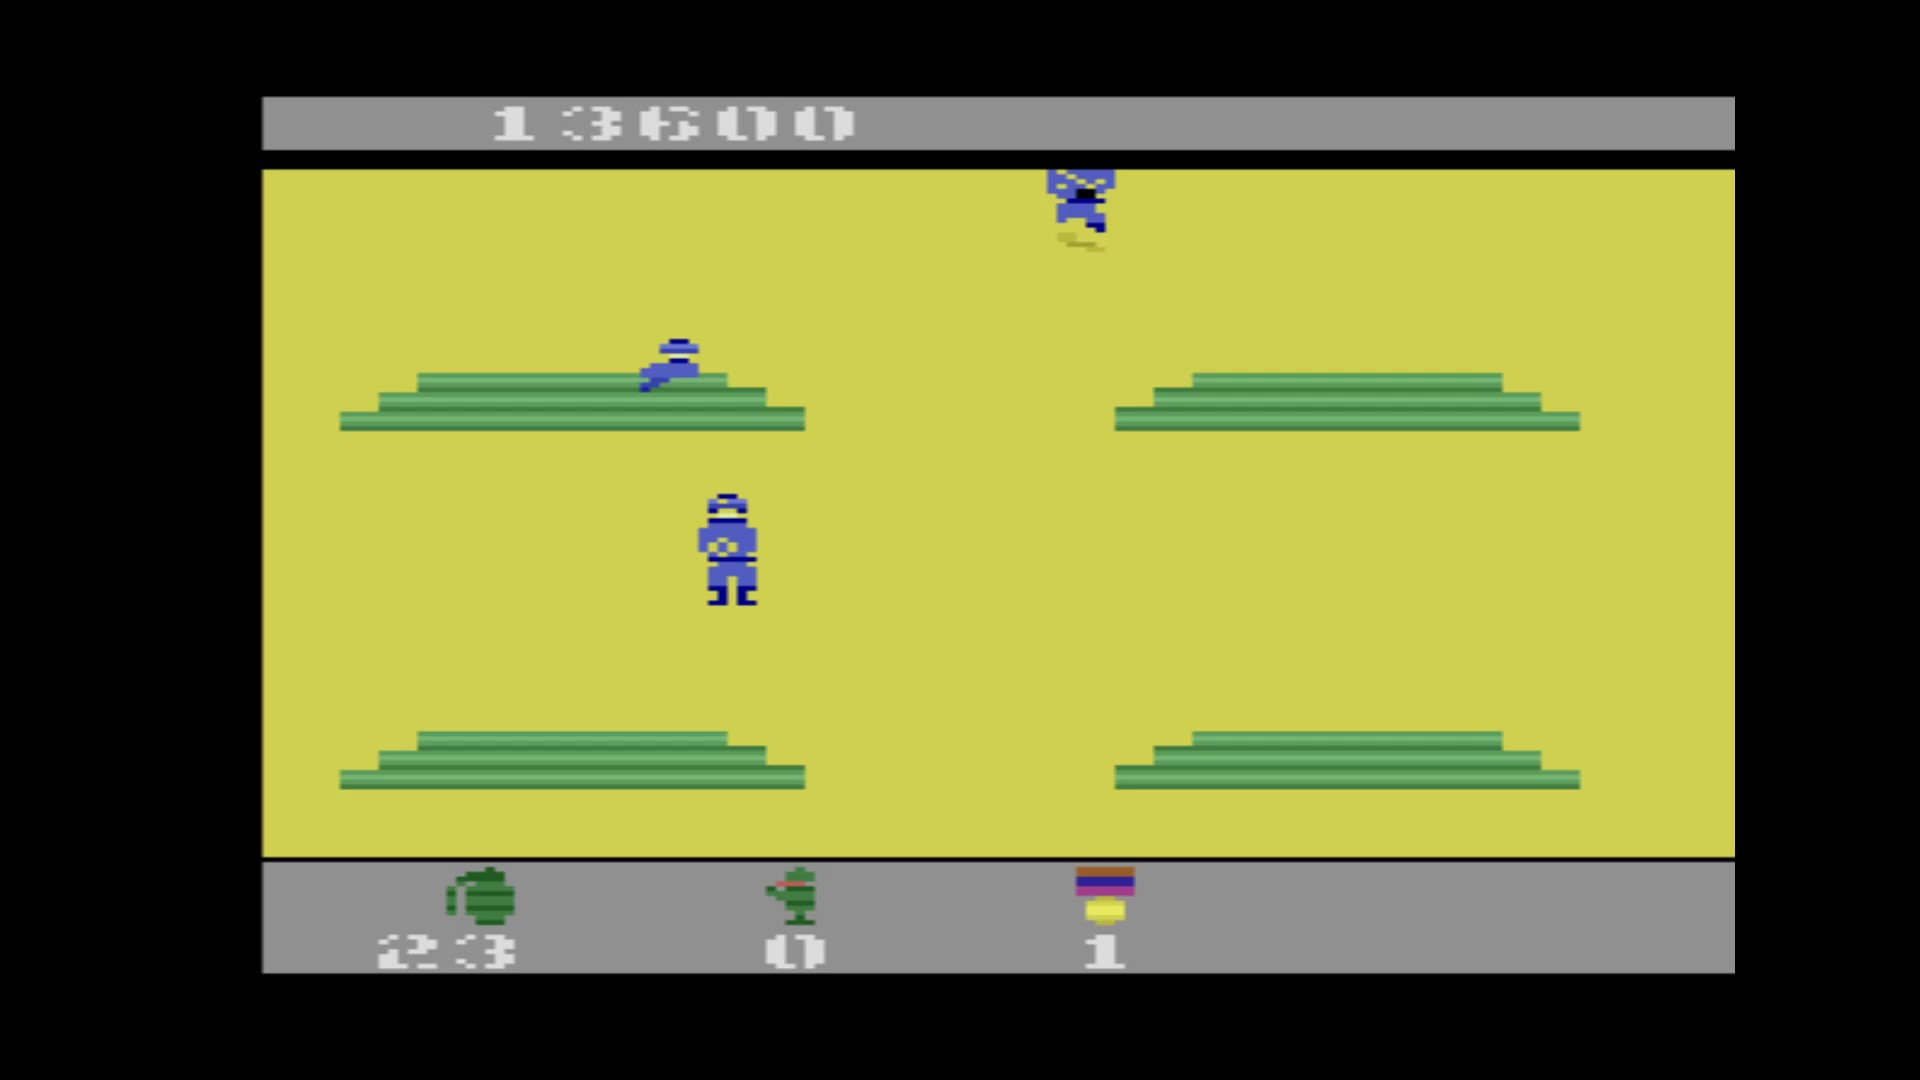 AkinNahtanoj: Commando (Atari 2600 Emulated) 13,600 points on 2020-08-17 05:24:12